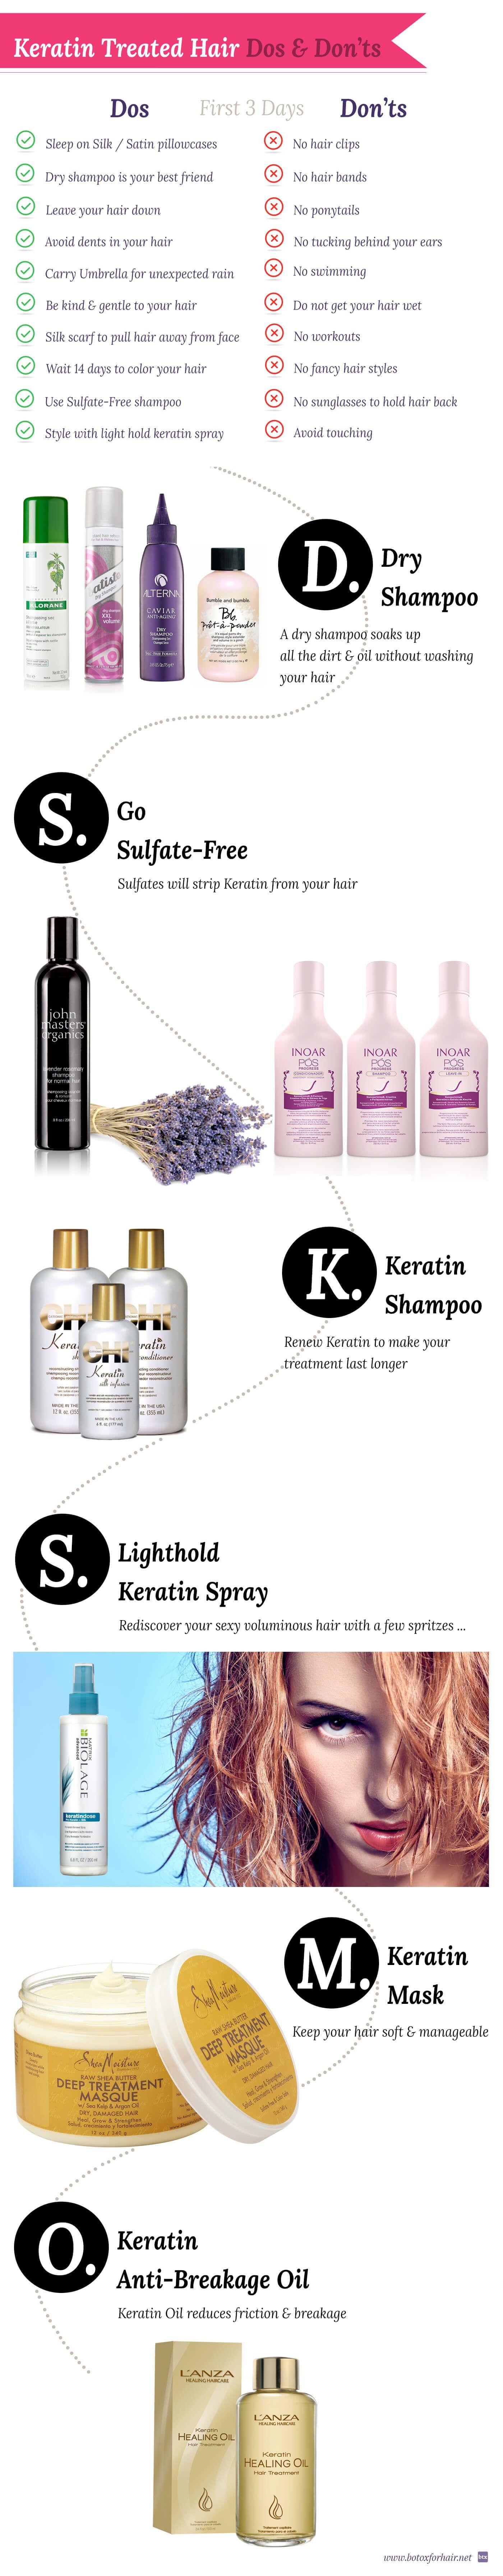 The Wrong Shampoos That Can Ruin Your Keratin Treated Hair Hair Growth Treatment Hair Treatment New Hair Growth